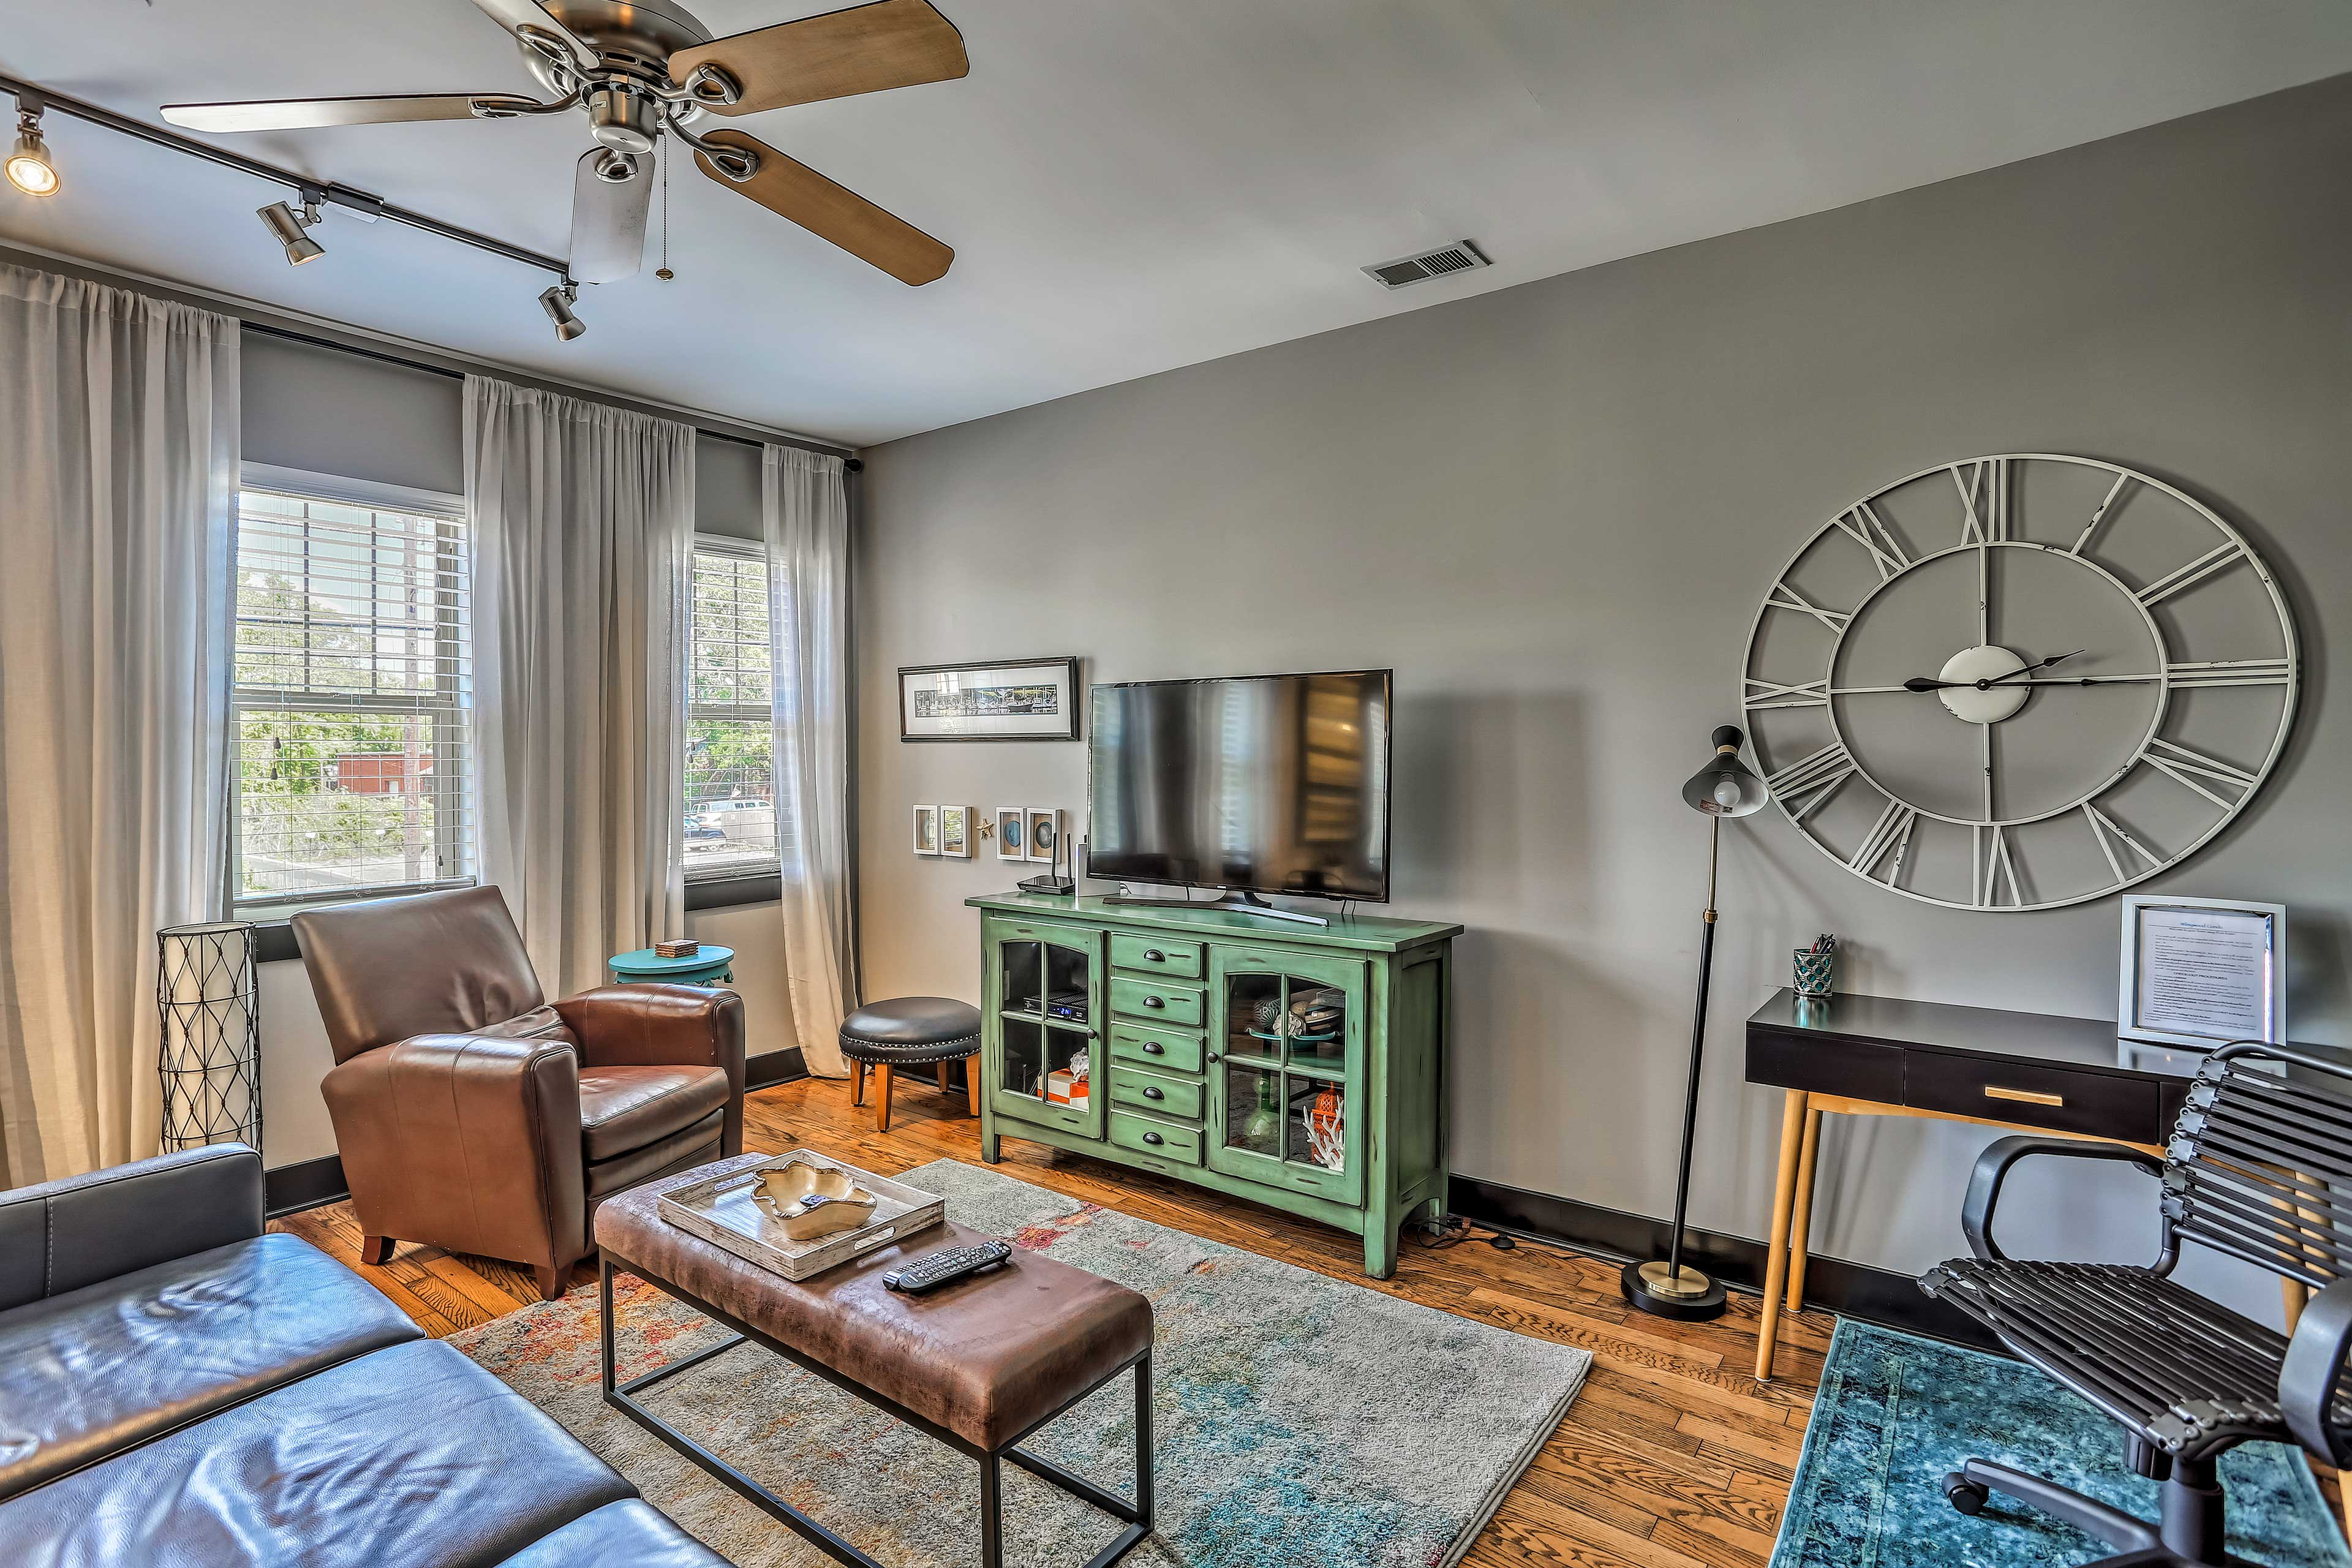 A memorable retreat awaits you at this Wilmington vacation rental condo!